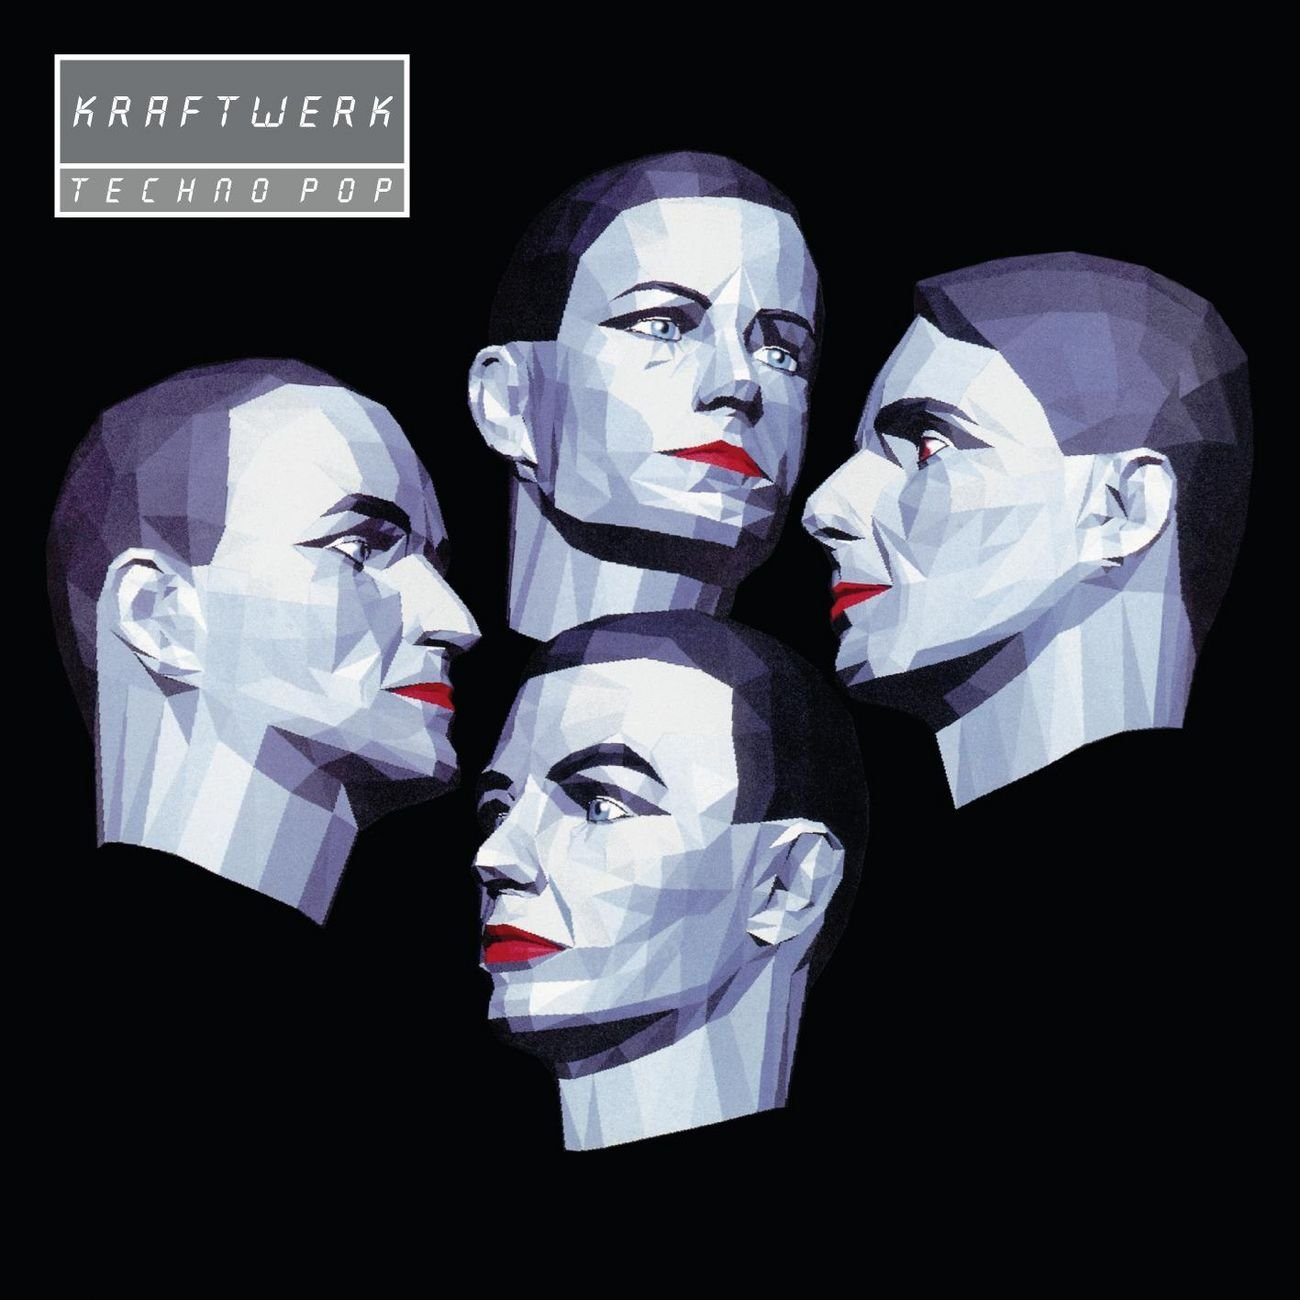 Kraftwerk - Techno Pop (2020) [FLAC] Download